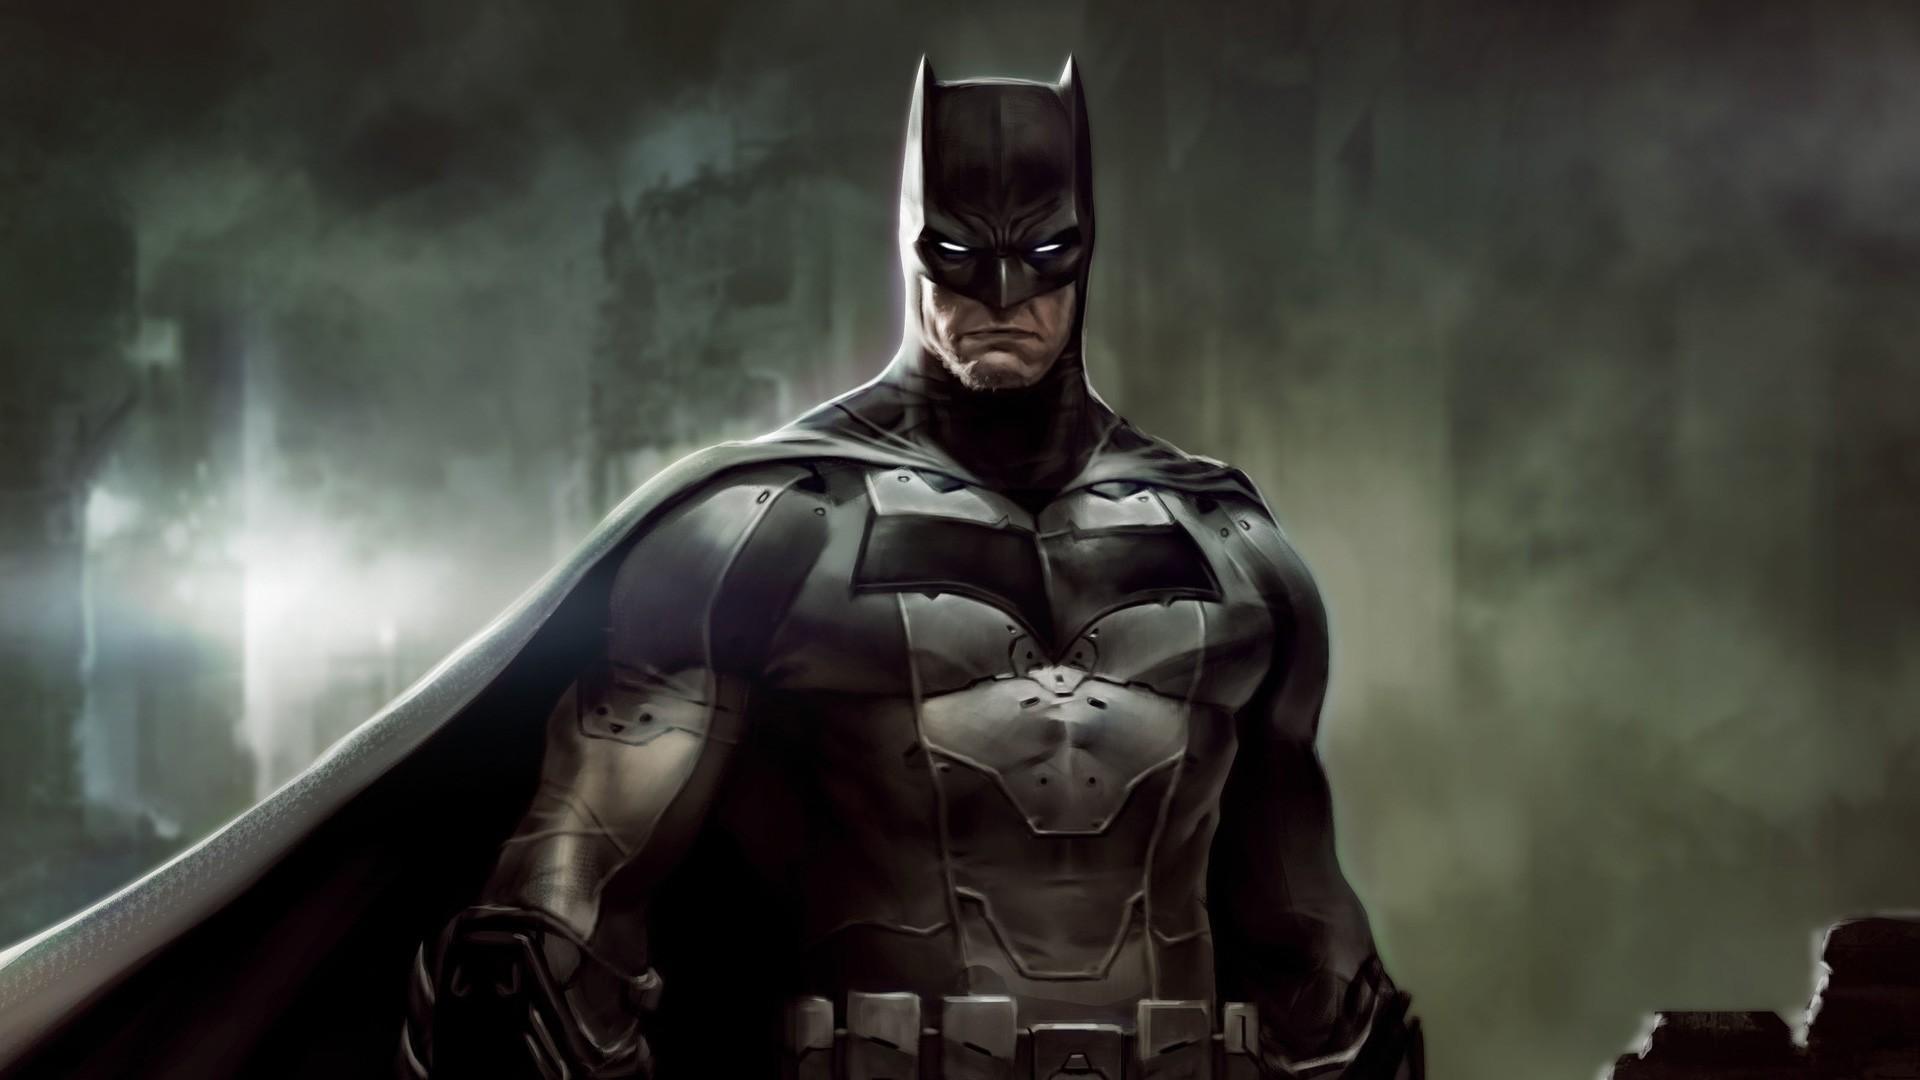 Batman Art Pic